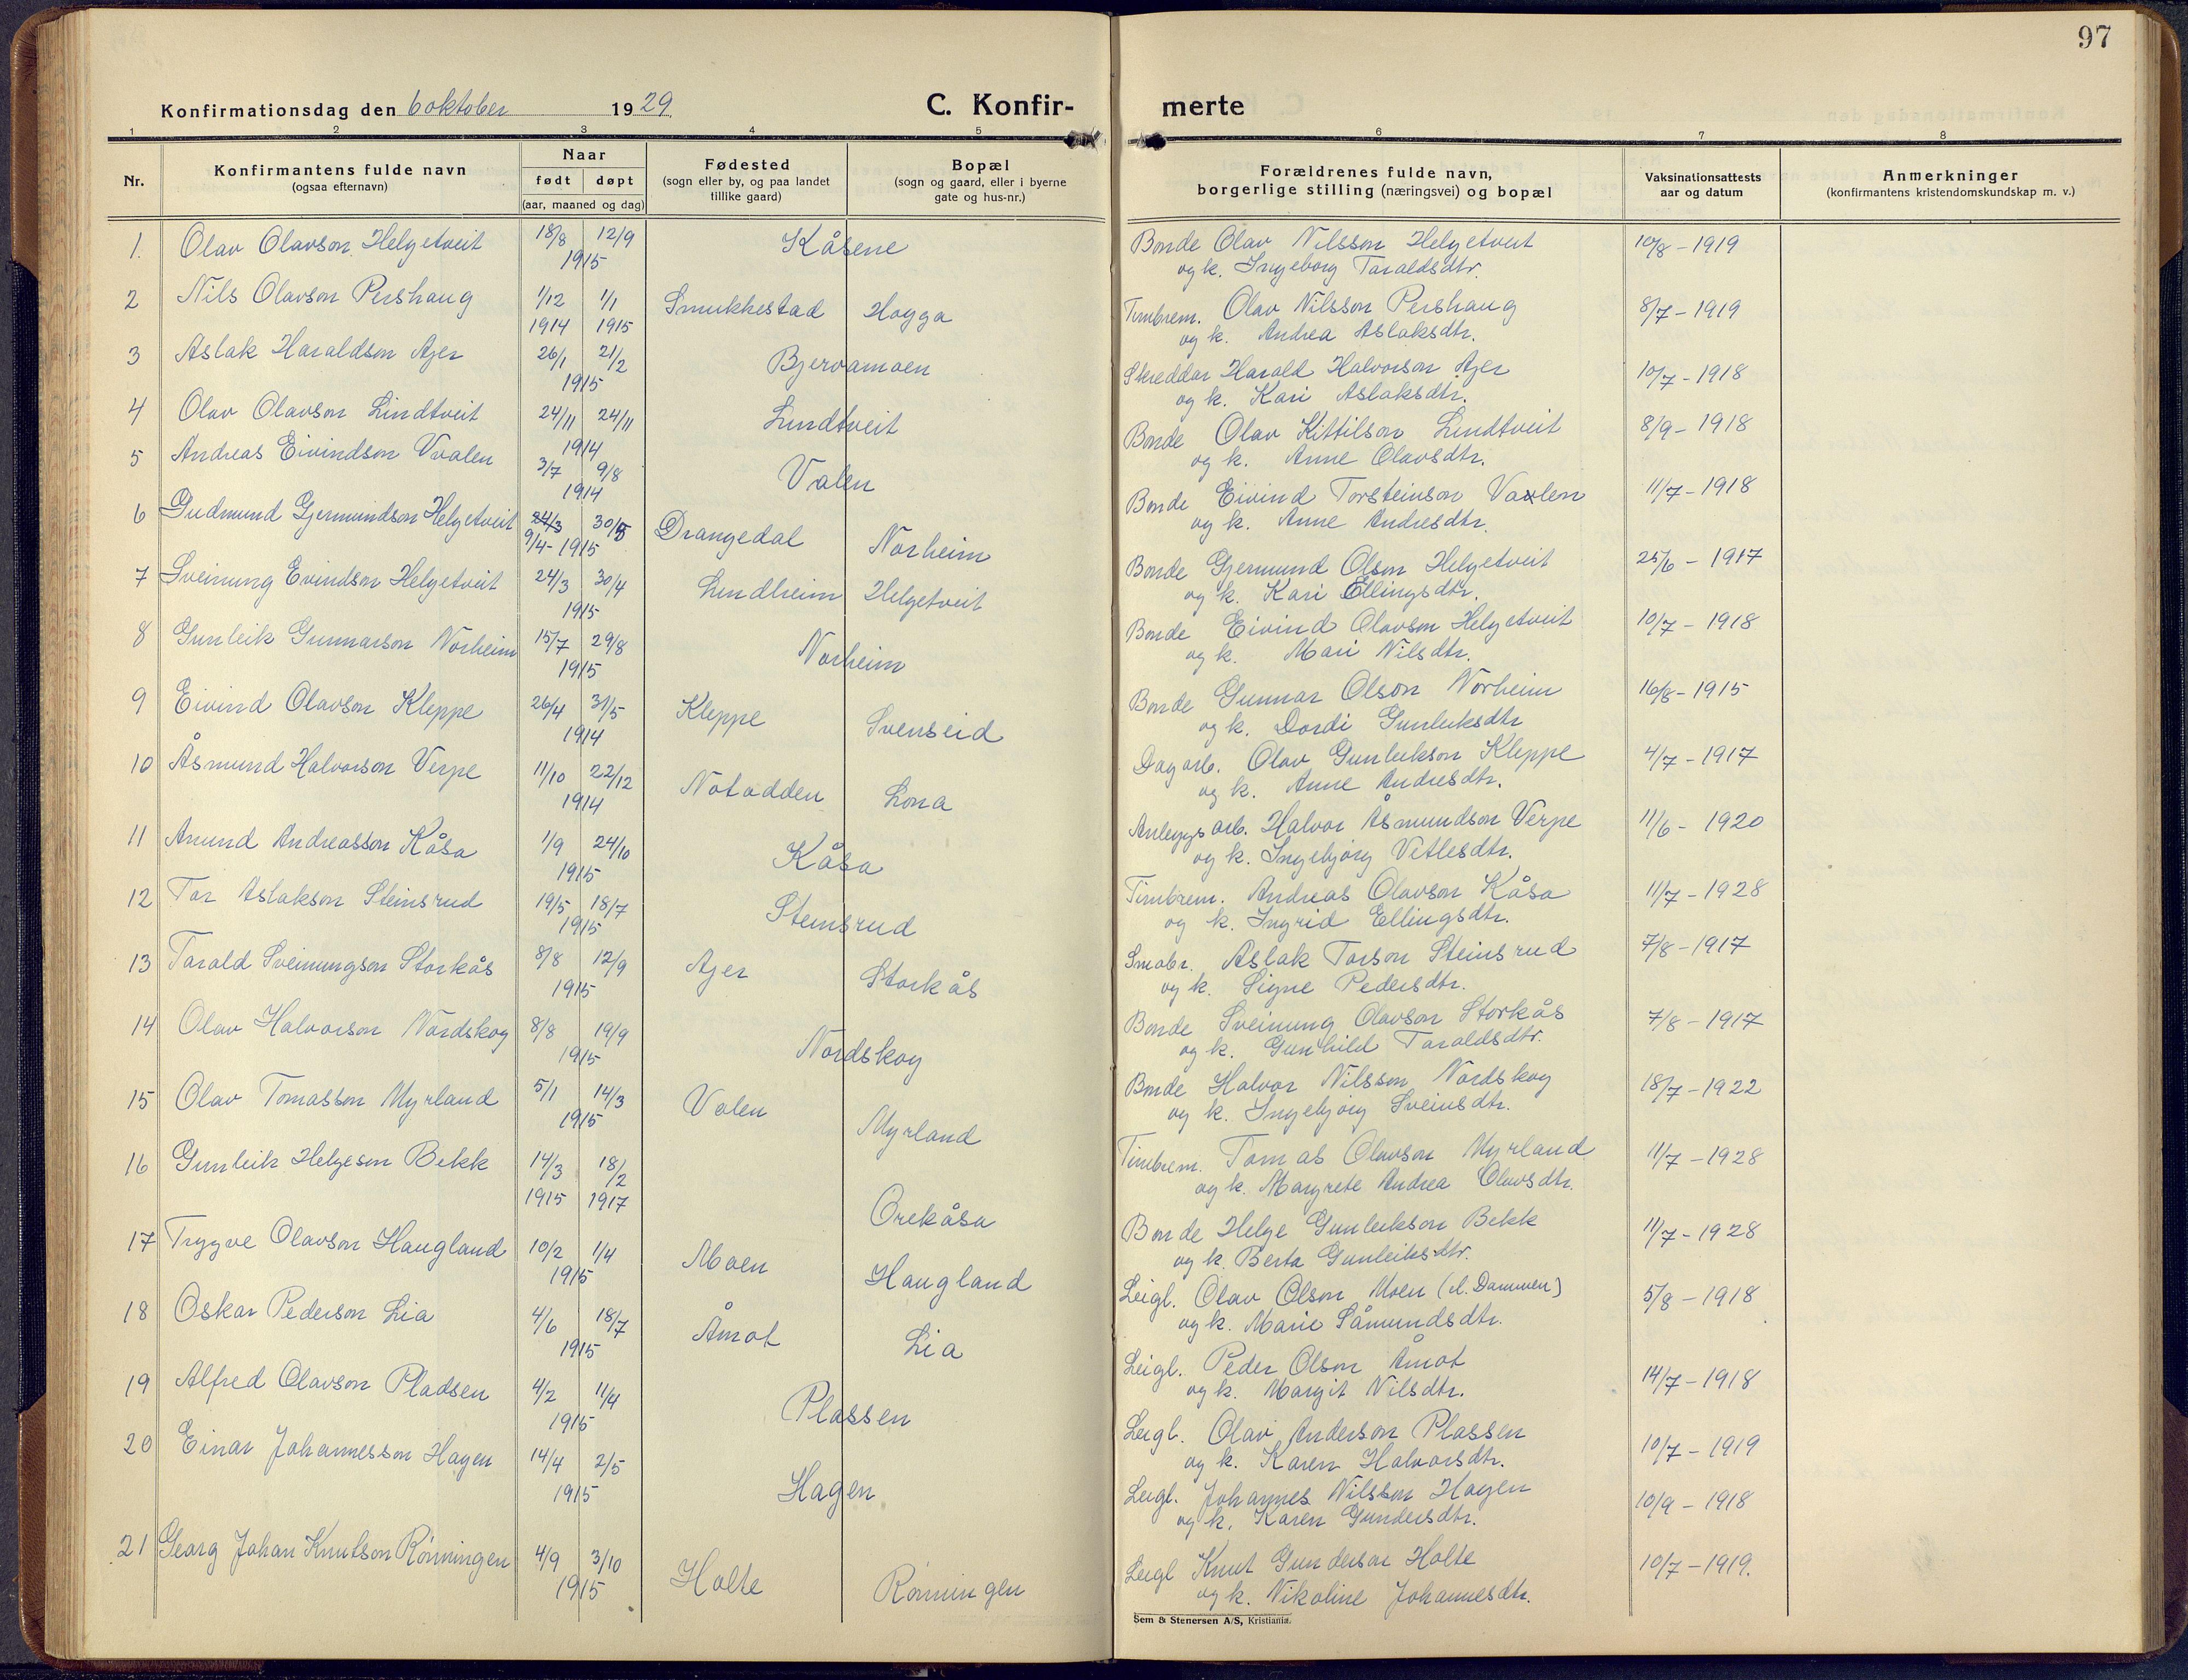 SAKO, Lunde kirkebøker, F/Fa/L0006: Ministerialbok nr. I 6, 1922-1940, s. 97